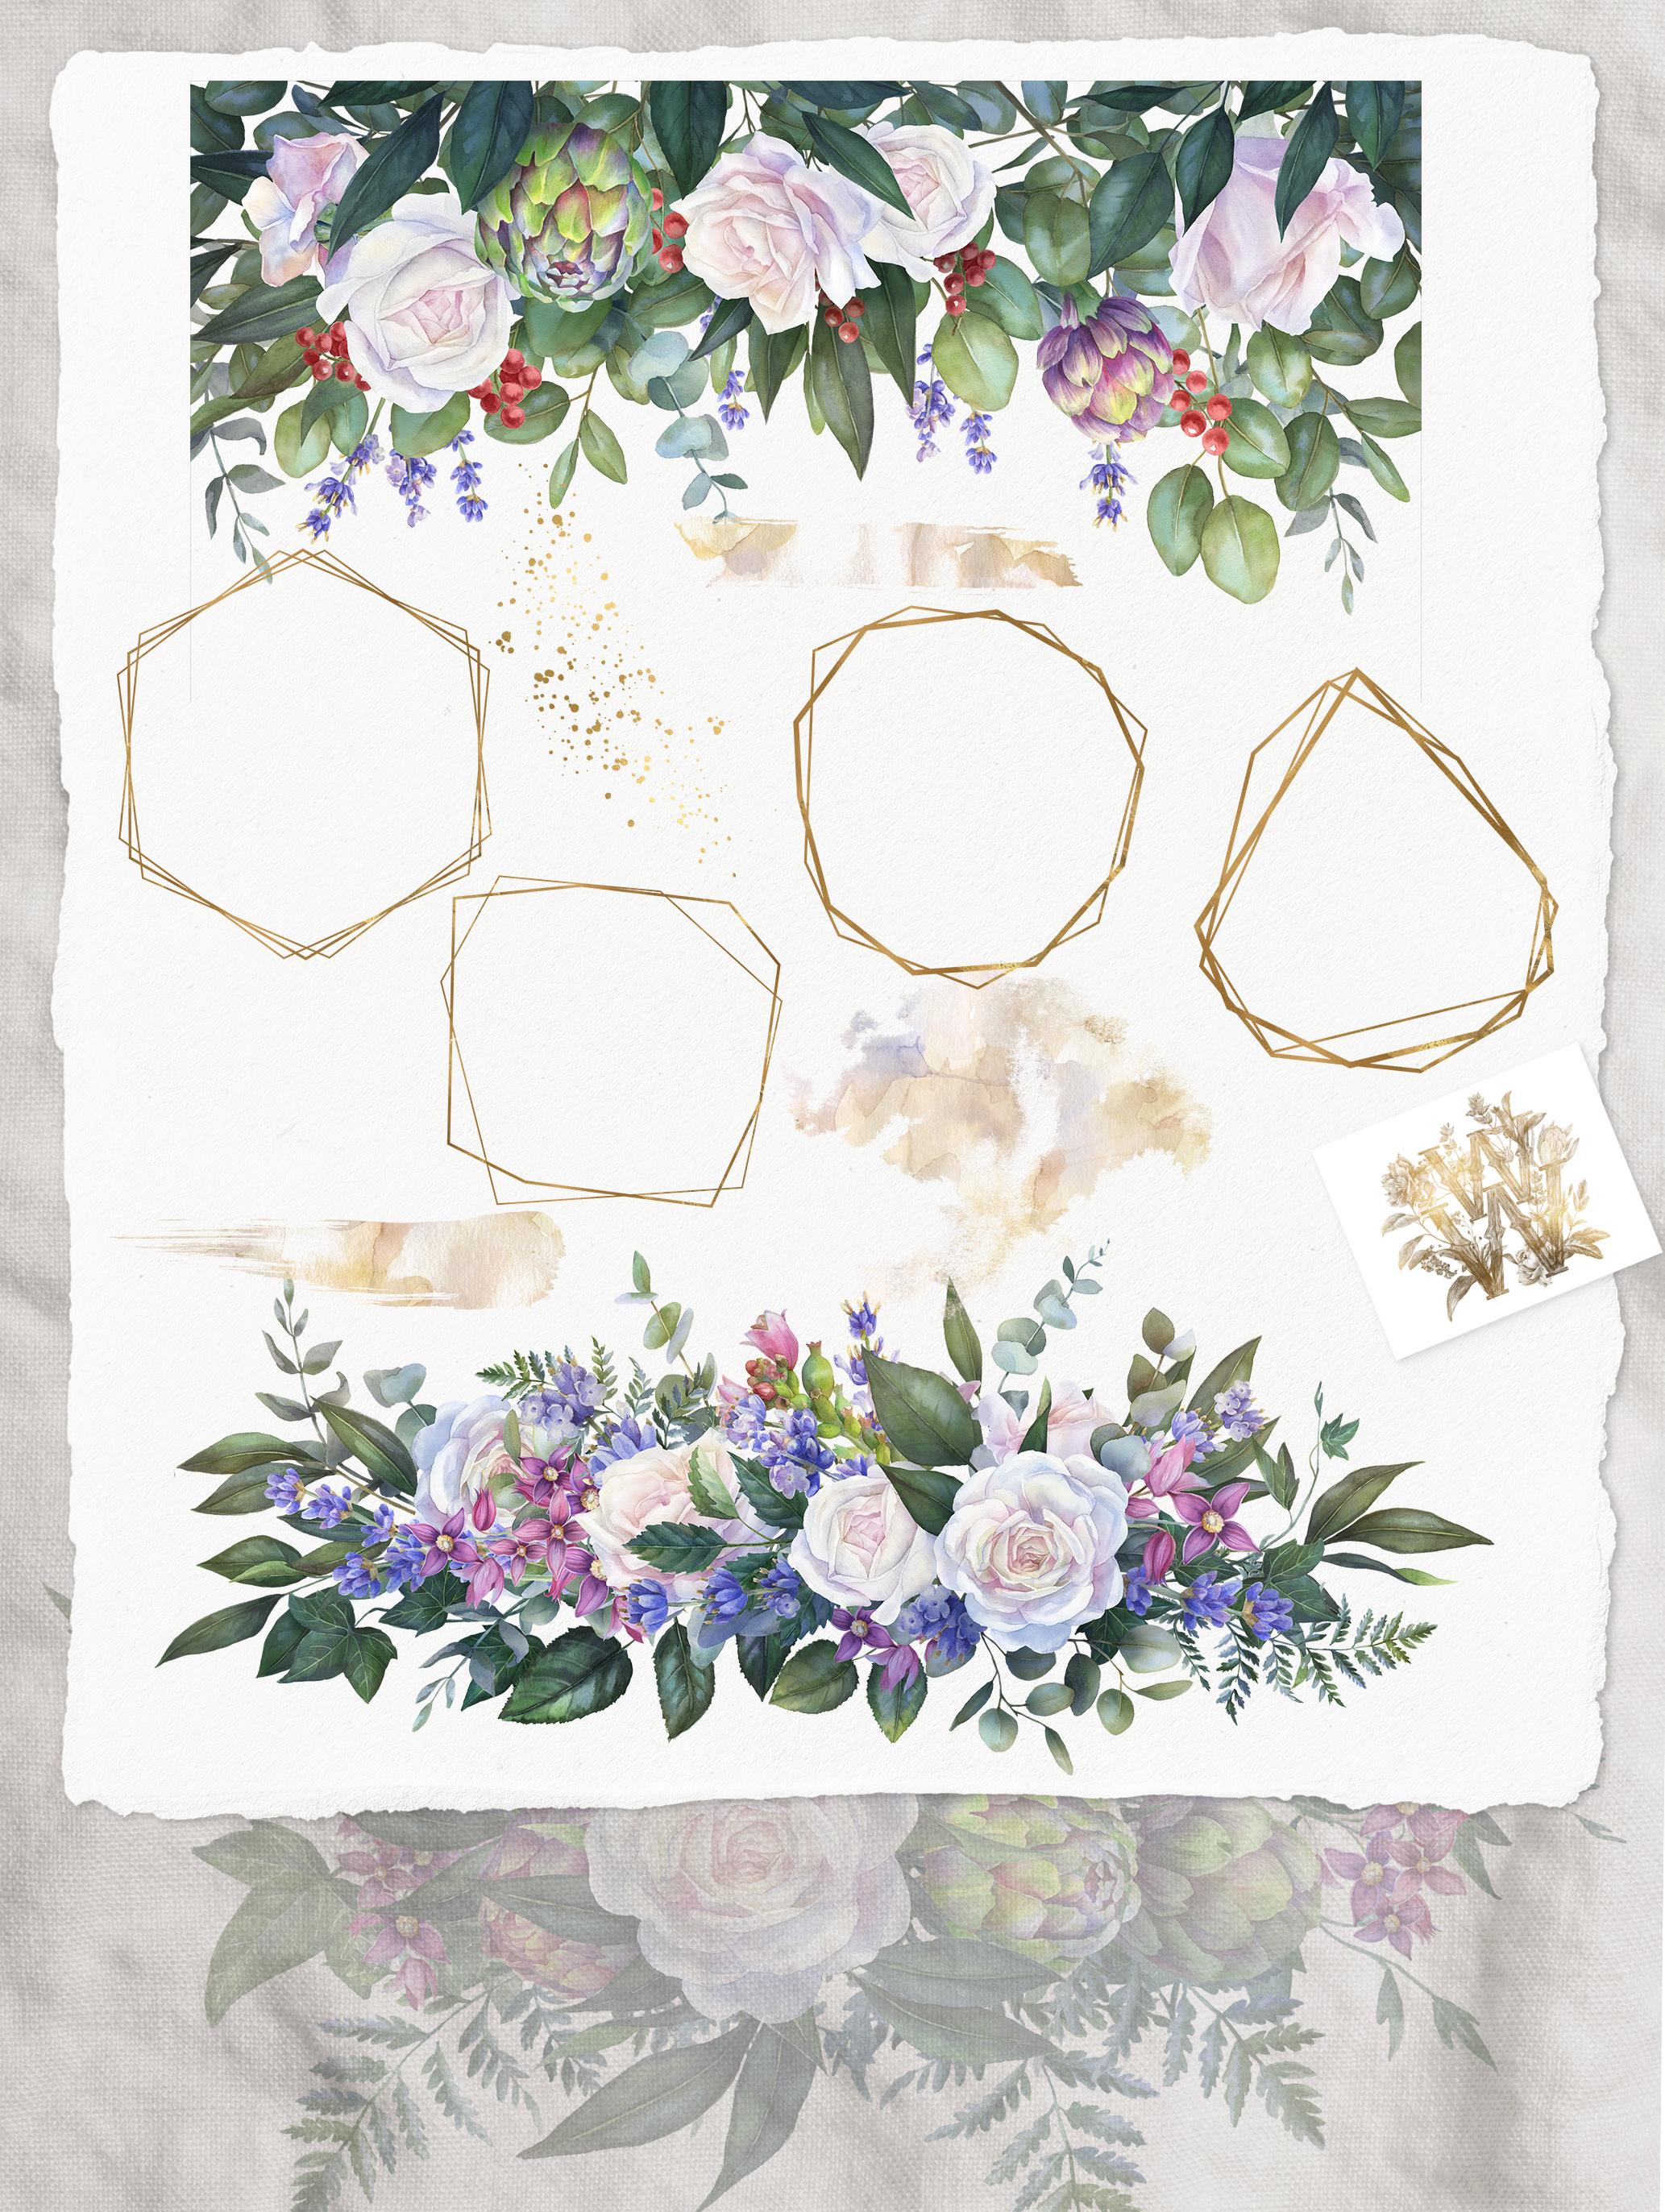 White rose wedding frame clip art example image 3